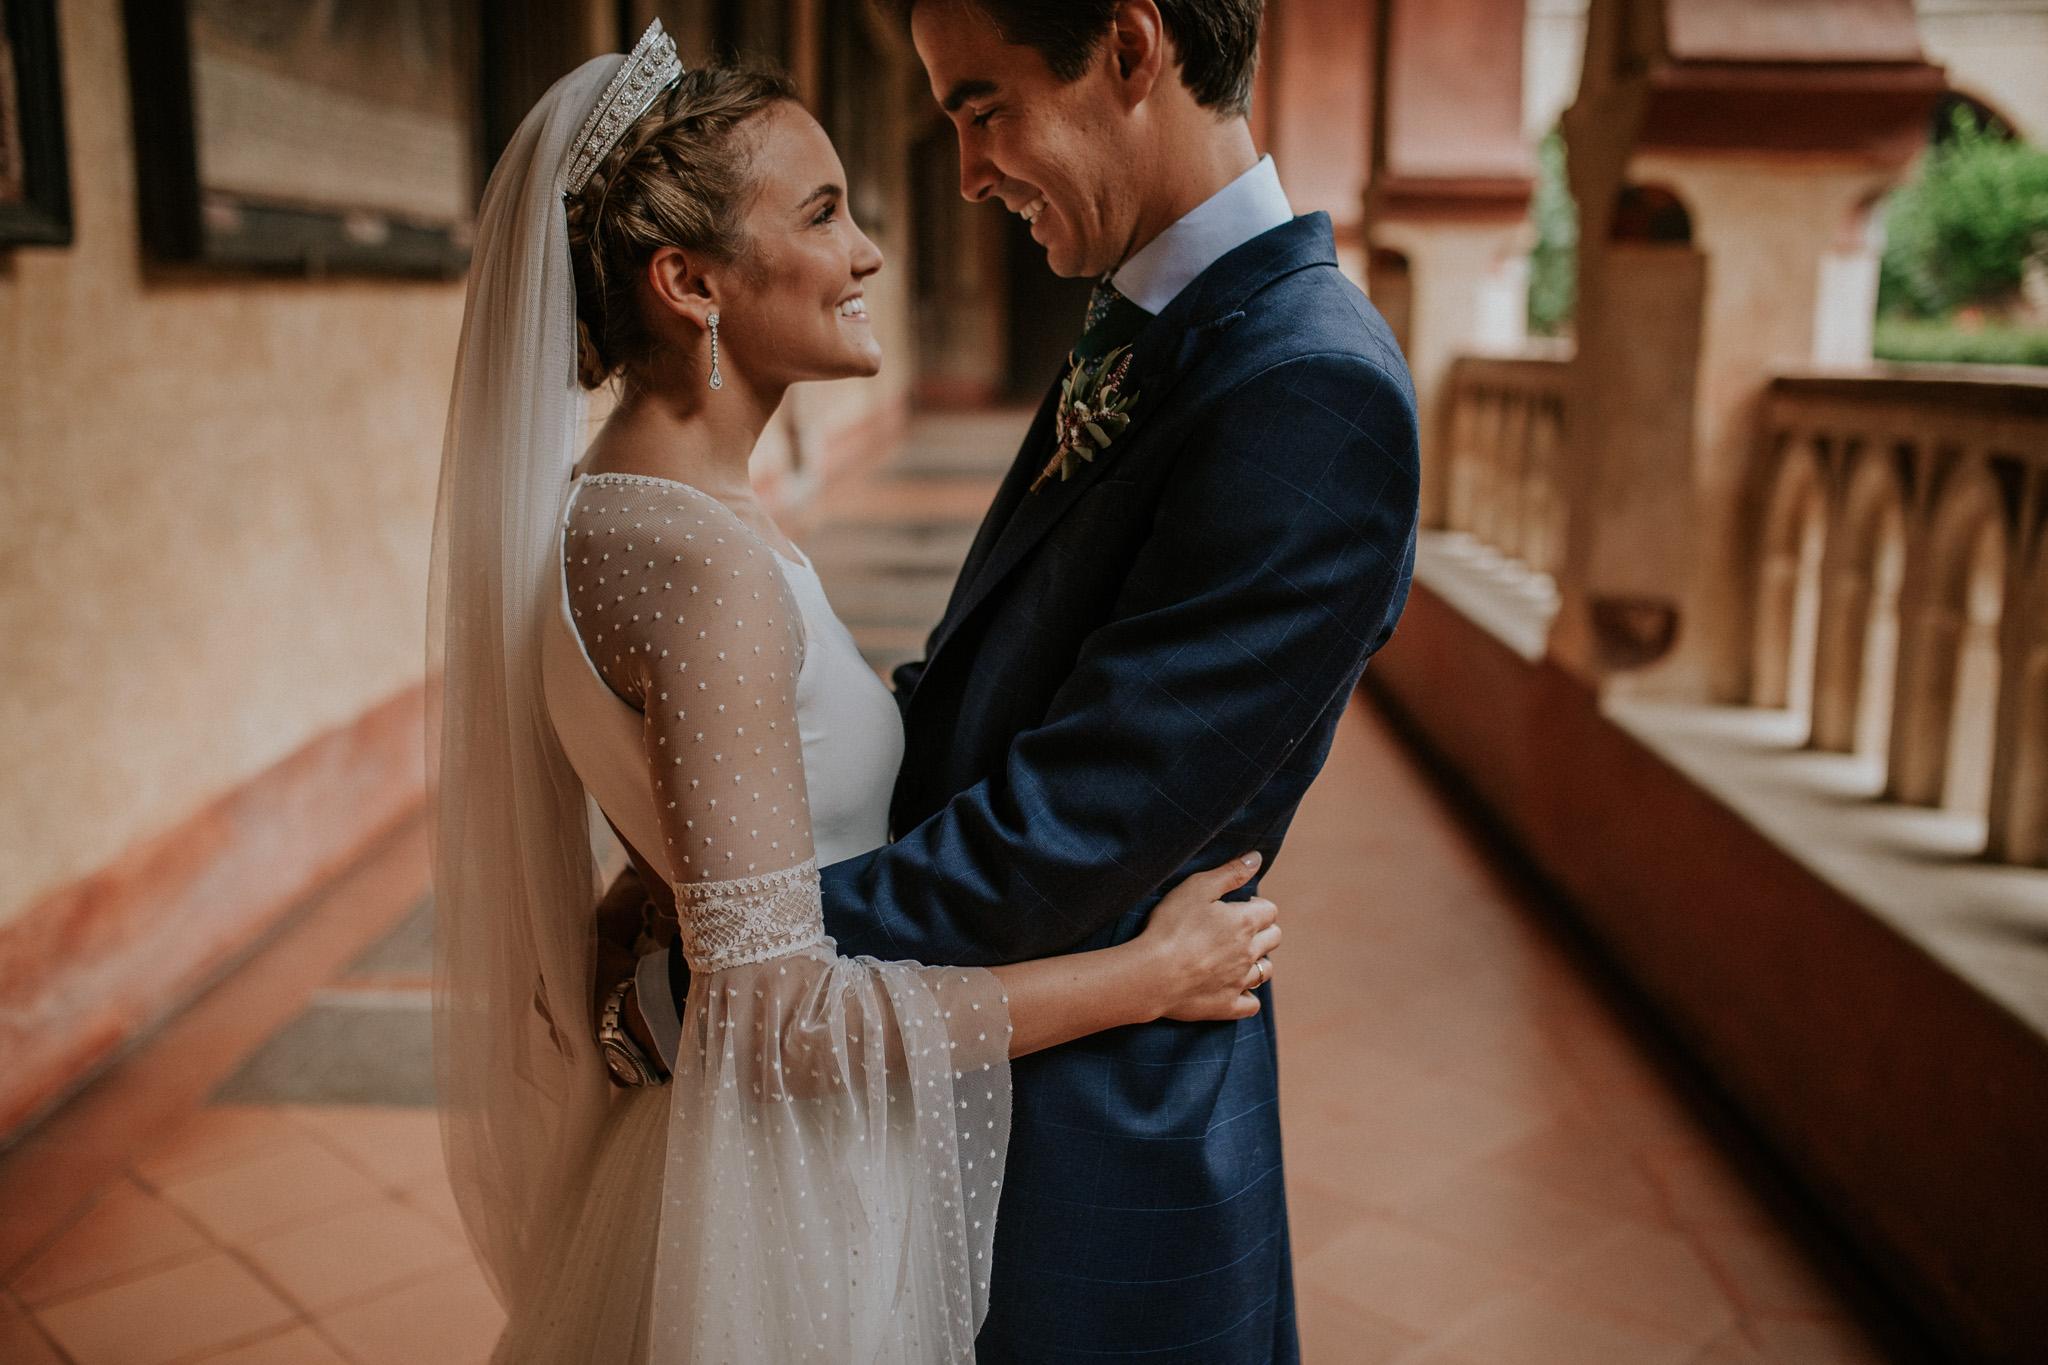 fotografia-boda-wedding-photographer-spain-concorazon-164